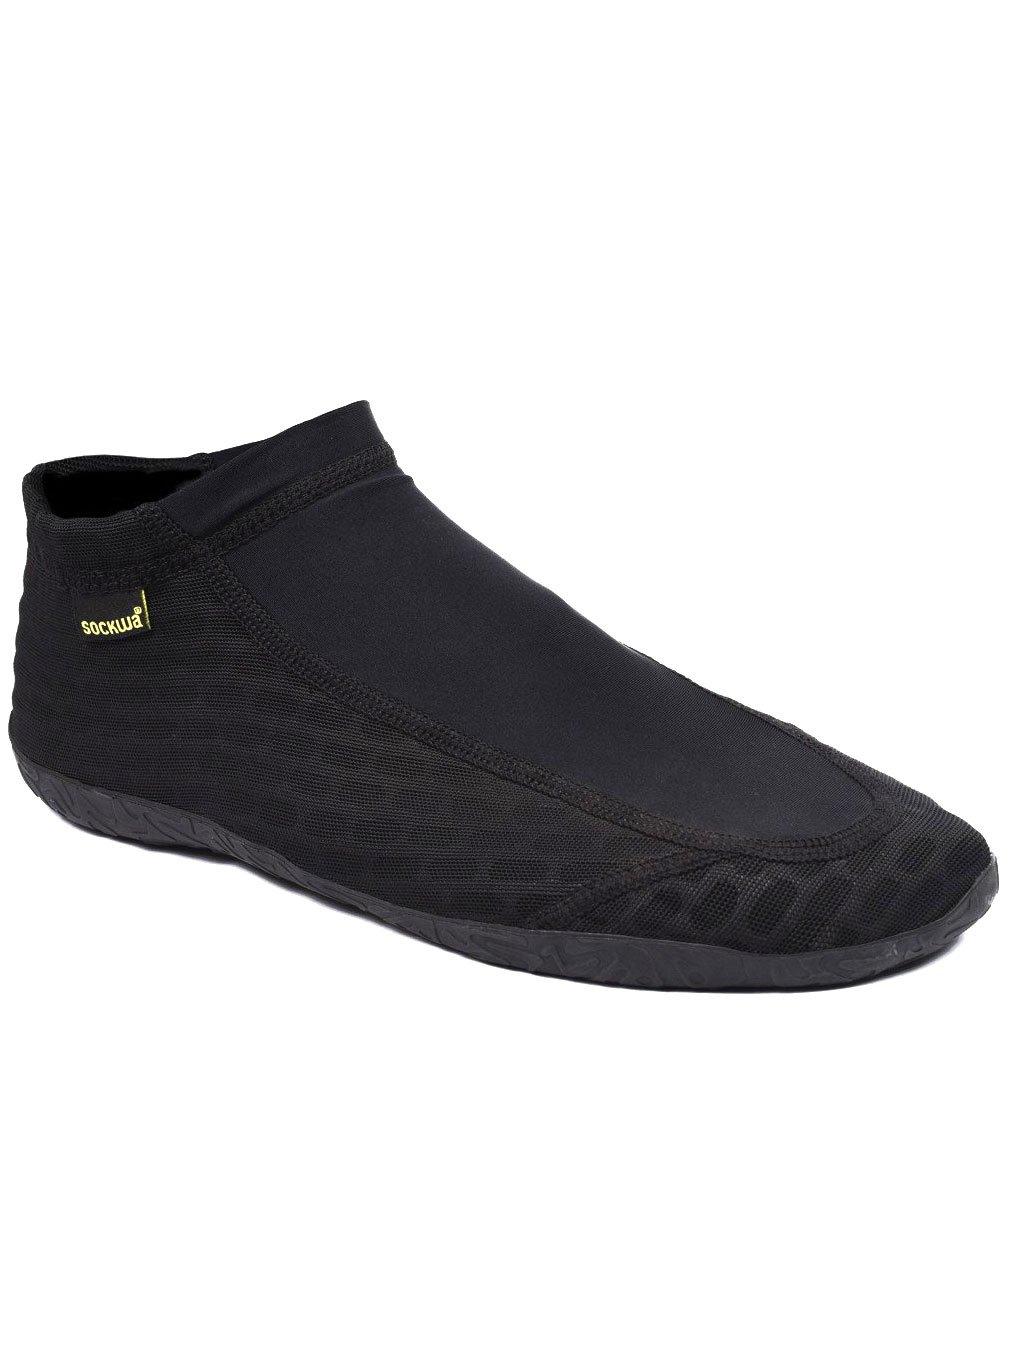 Sockwa X8 Breathable Barefoot Shoes B00F3KEN28 W6/M5|Black